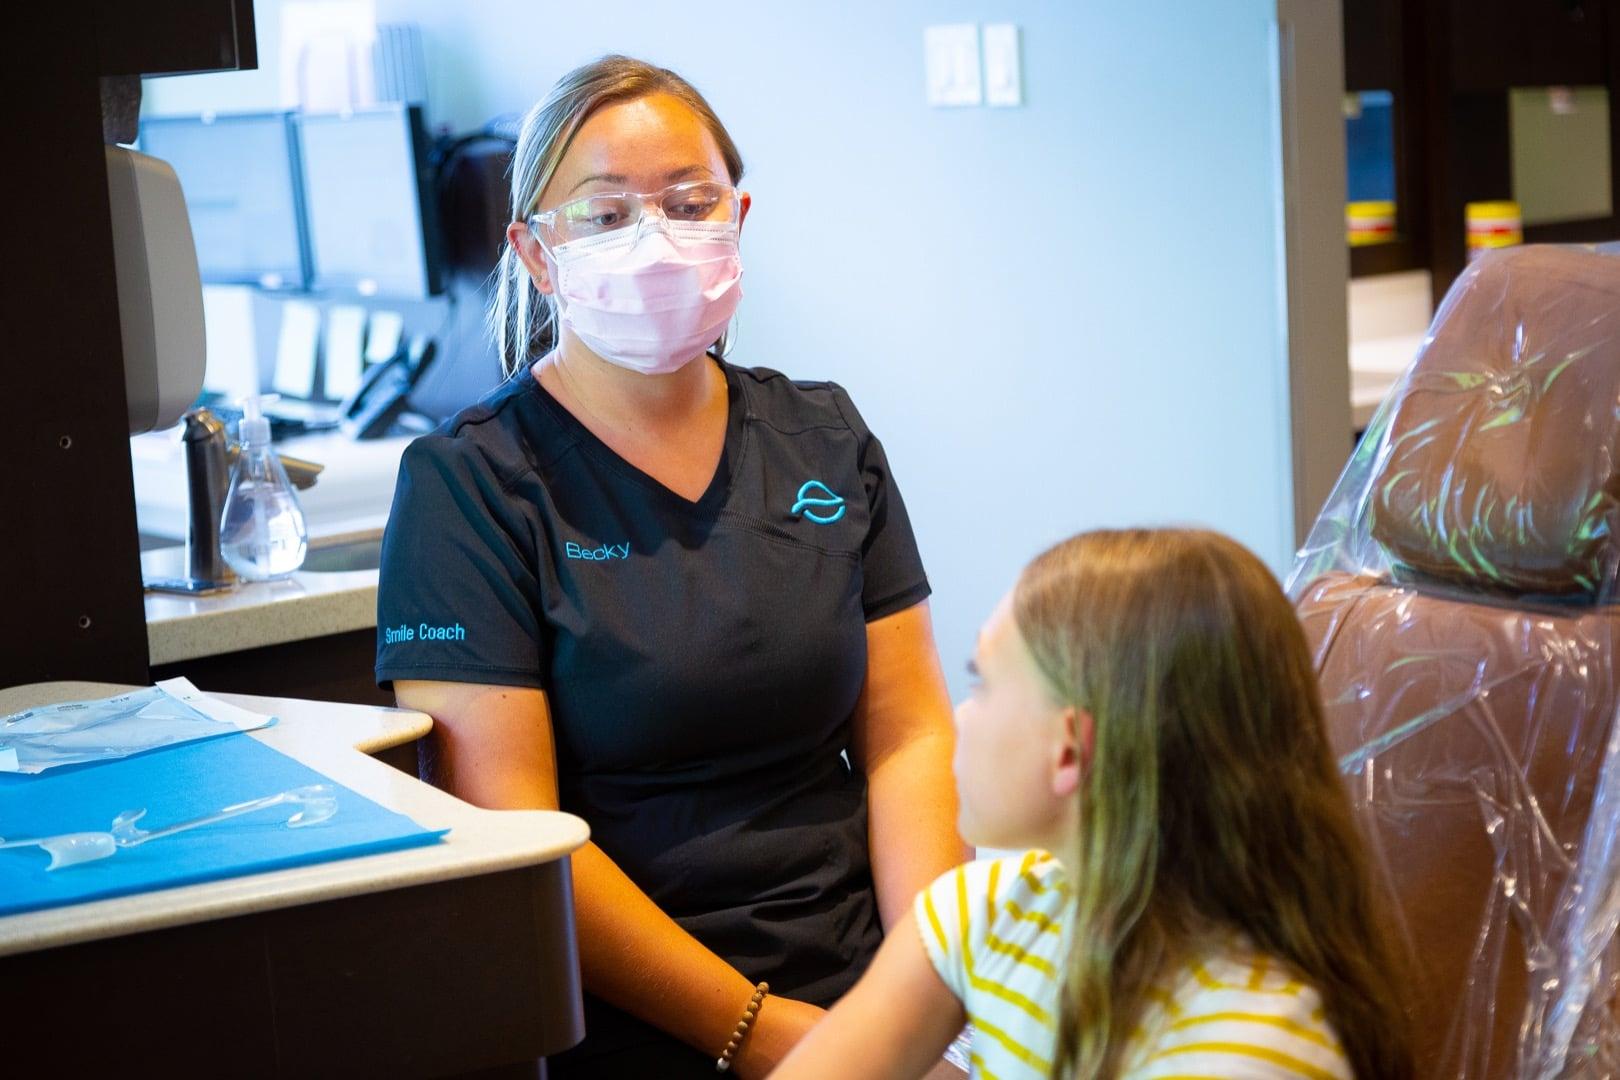 Staff Candids Oceans Edge Orthodontics 2020 Nanaimo Canada Orthodontist 92 - FAQ About Orthodontics